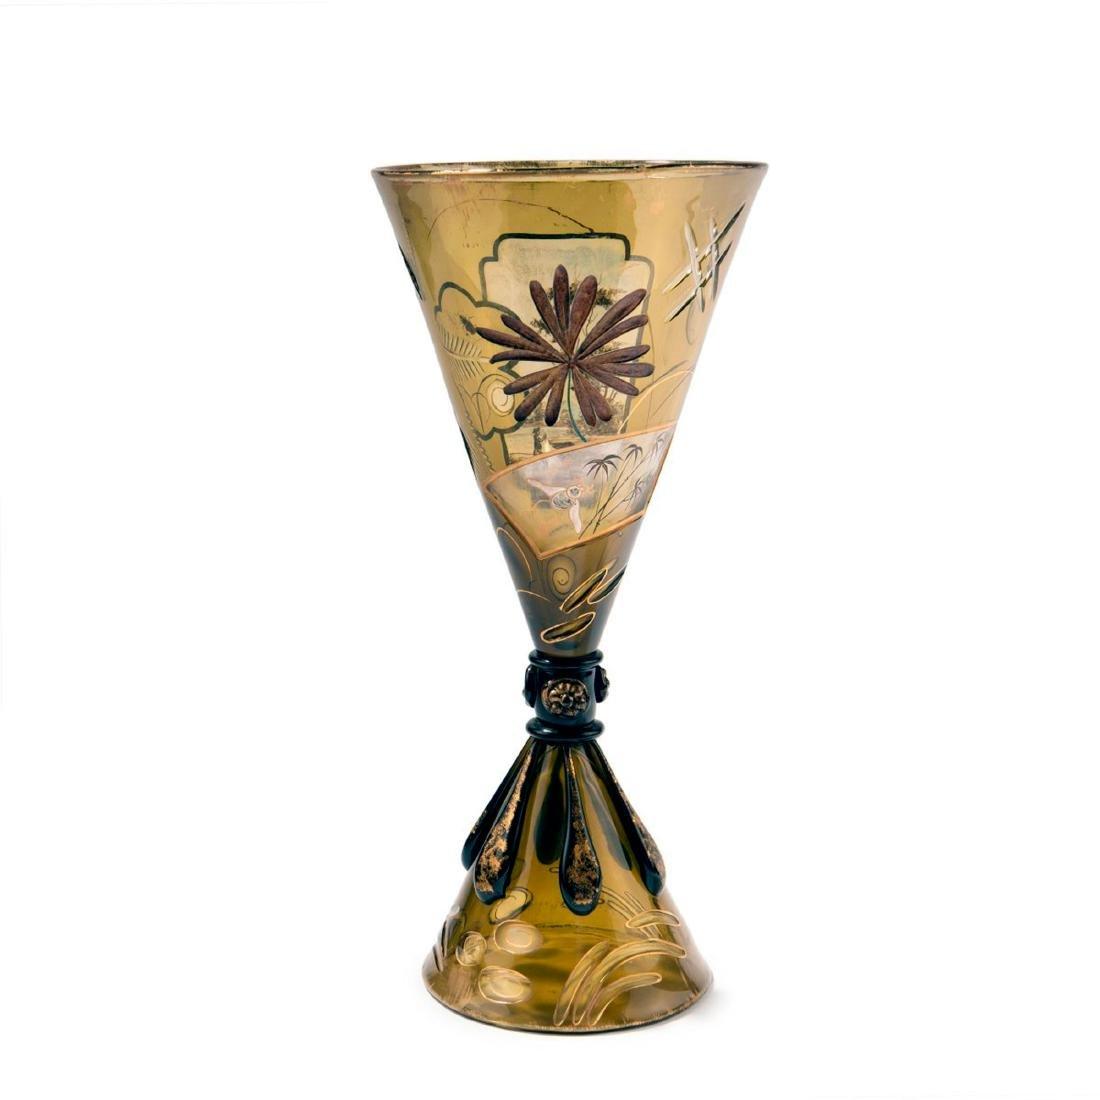 Historicising vase, 1887 - 2